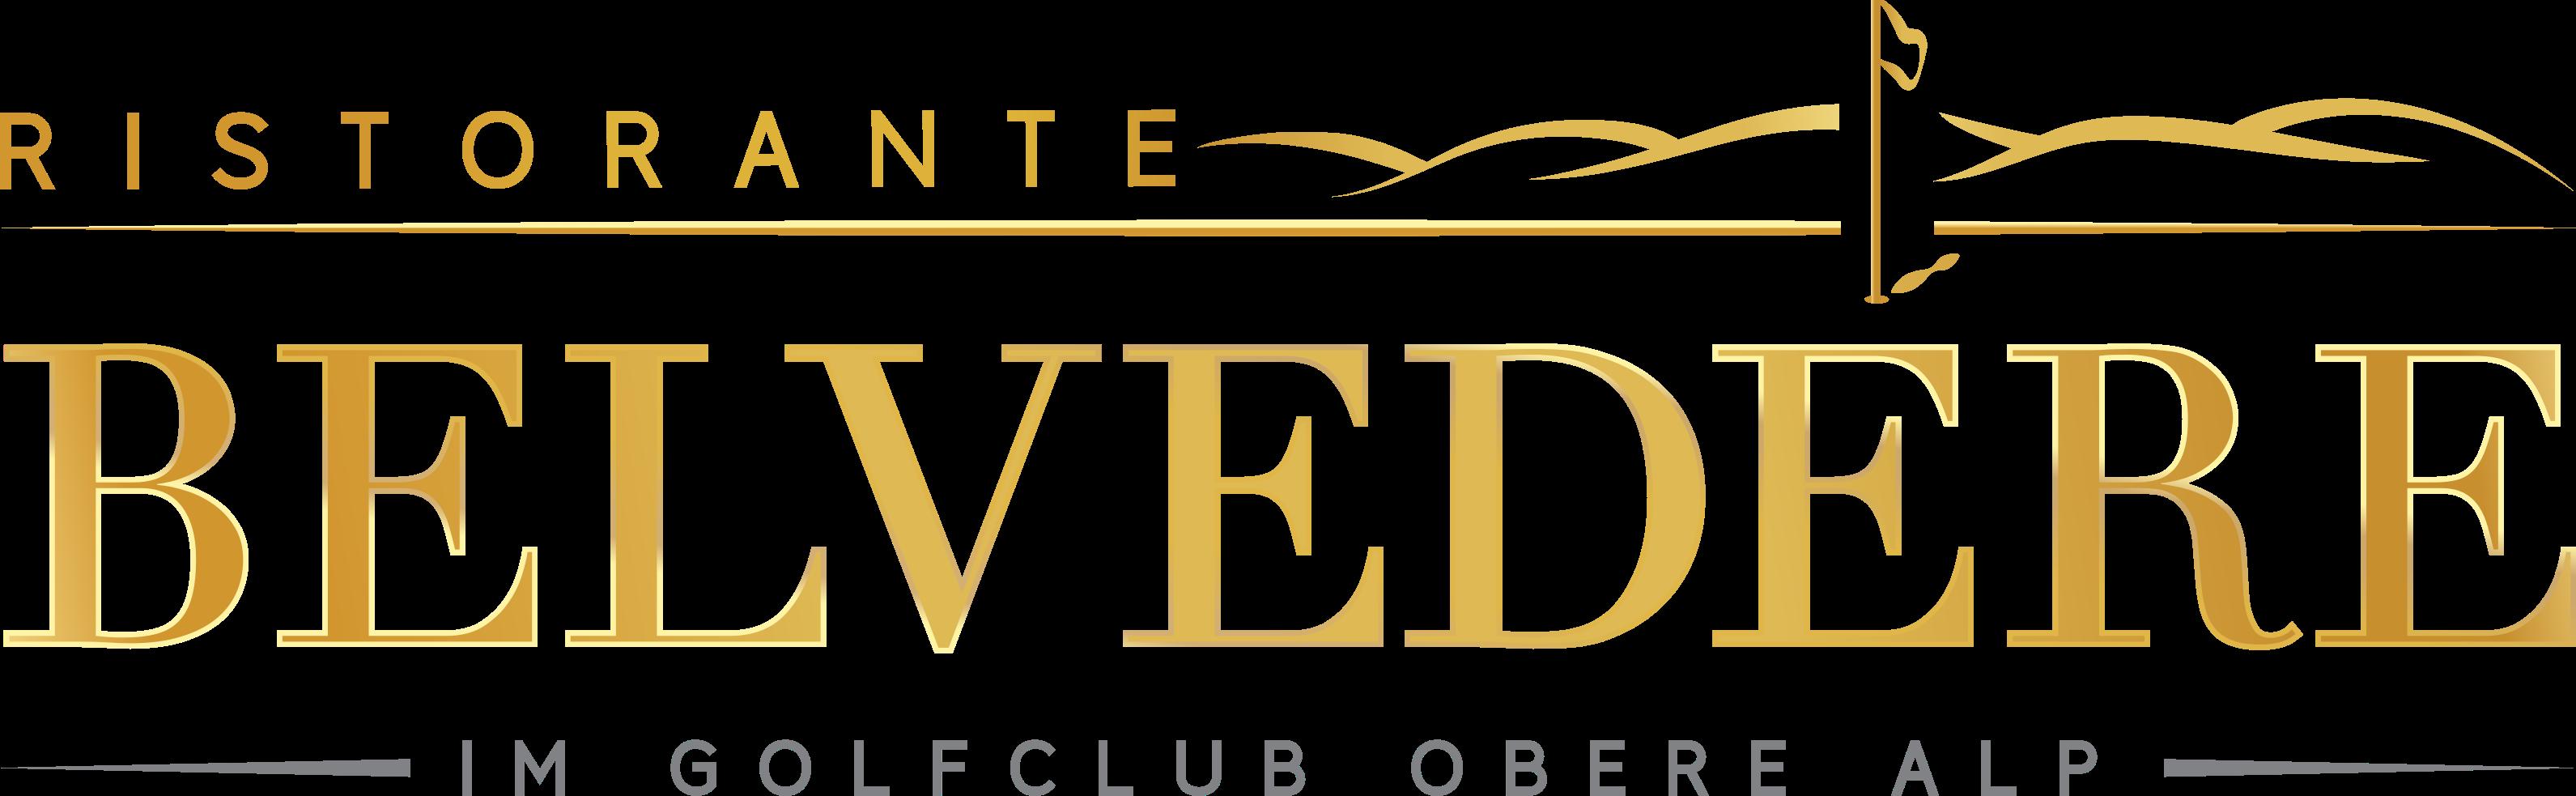 Belvedere Logo png